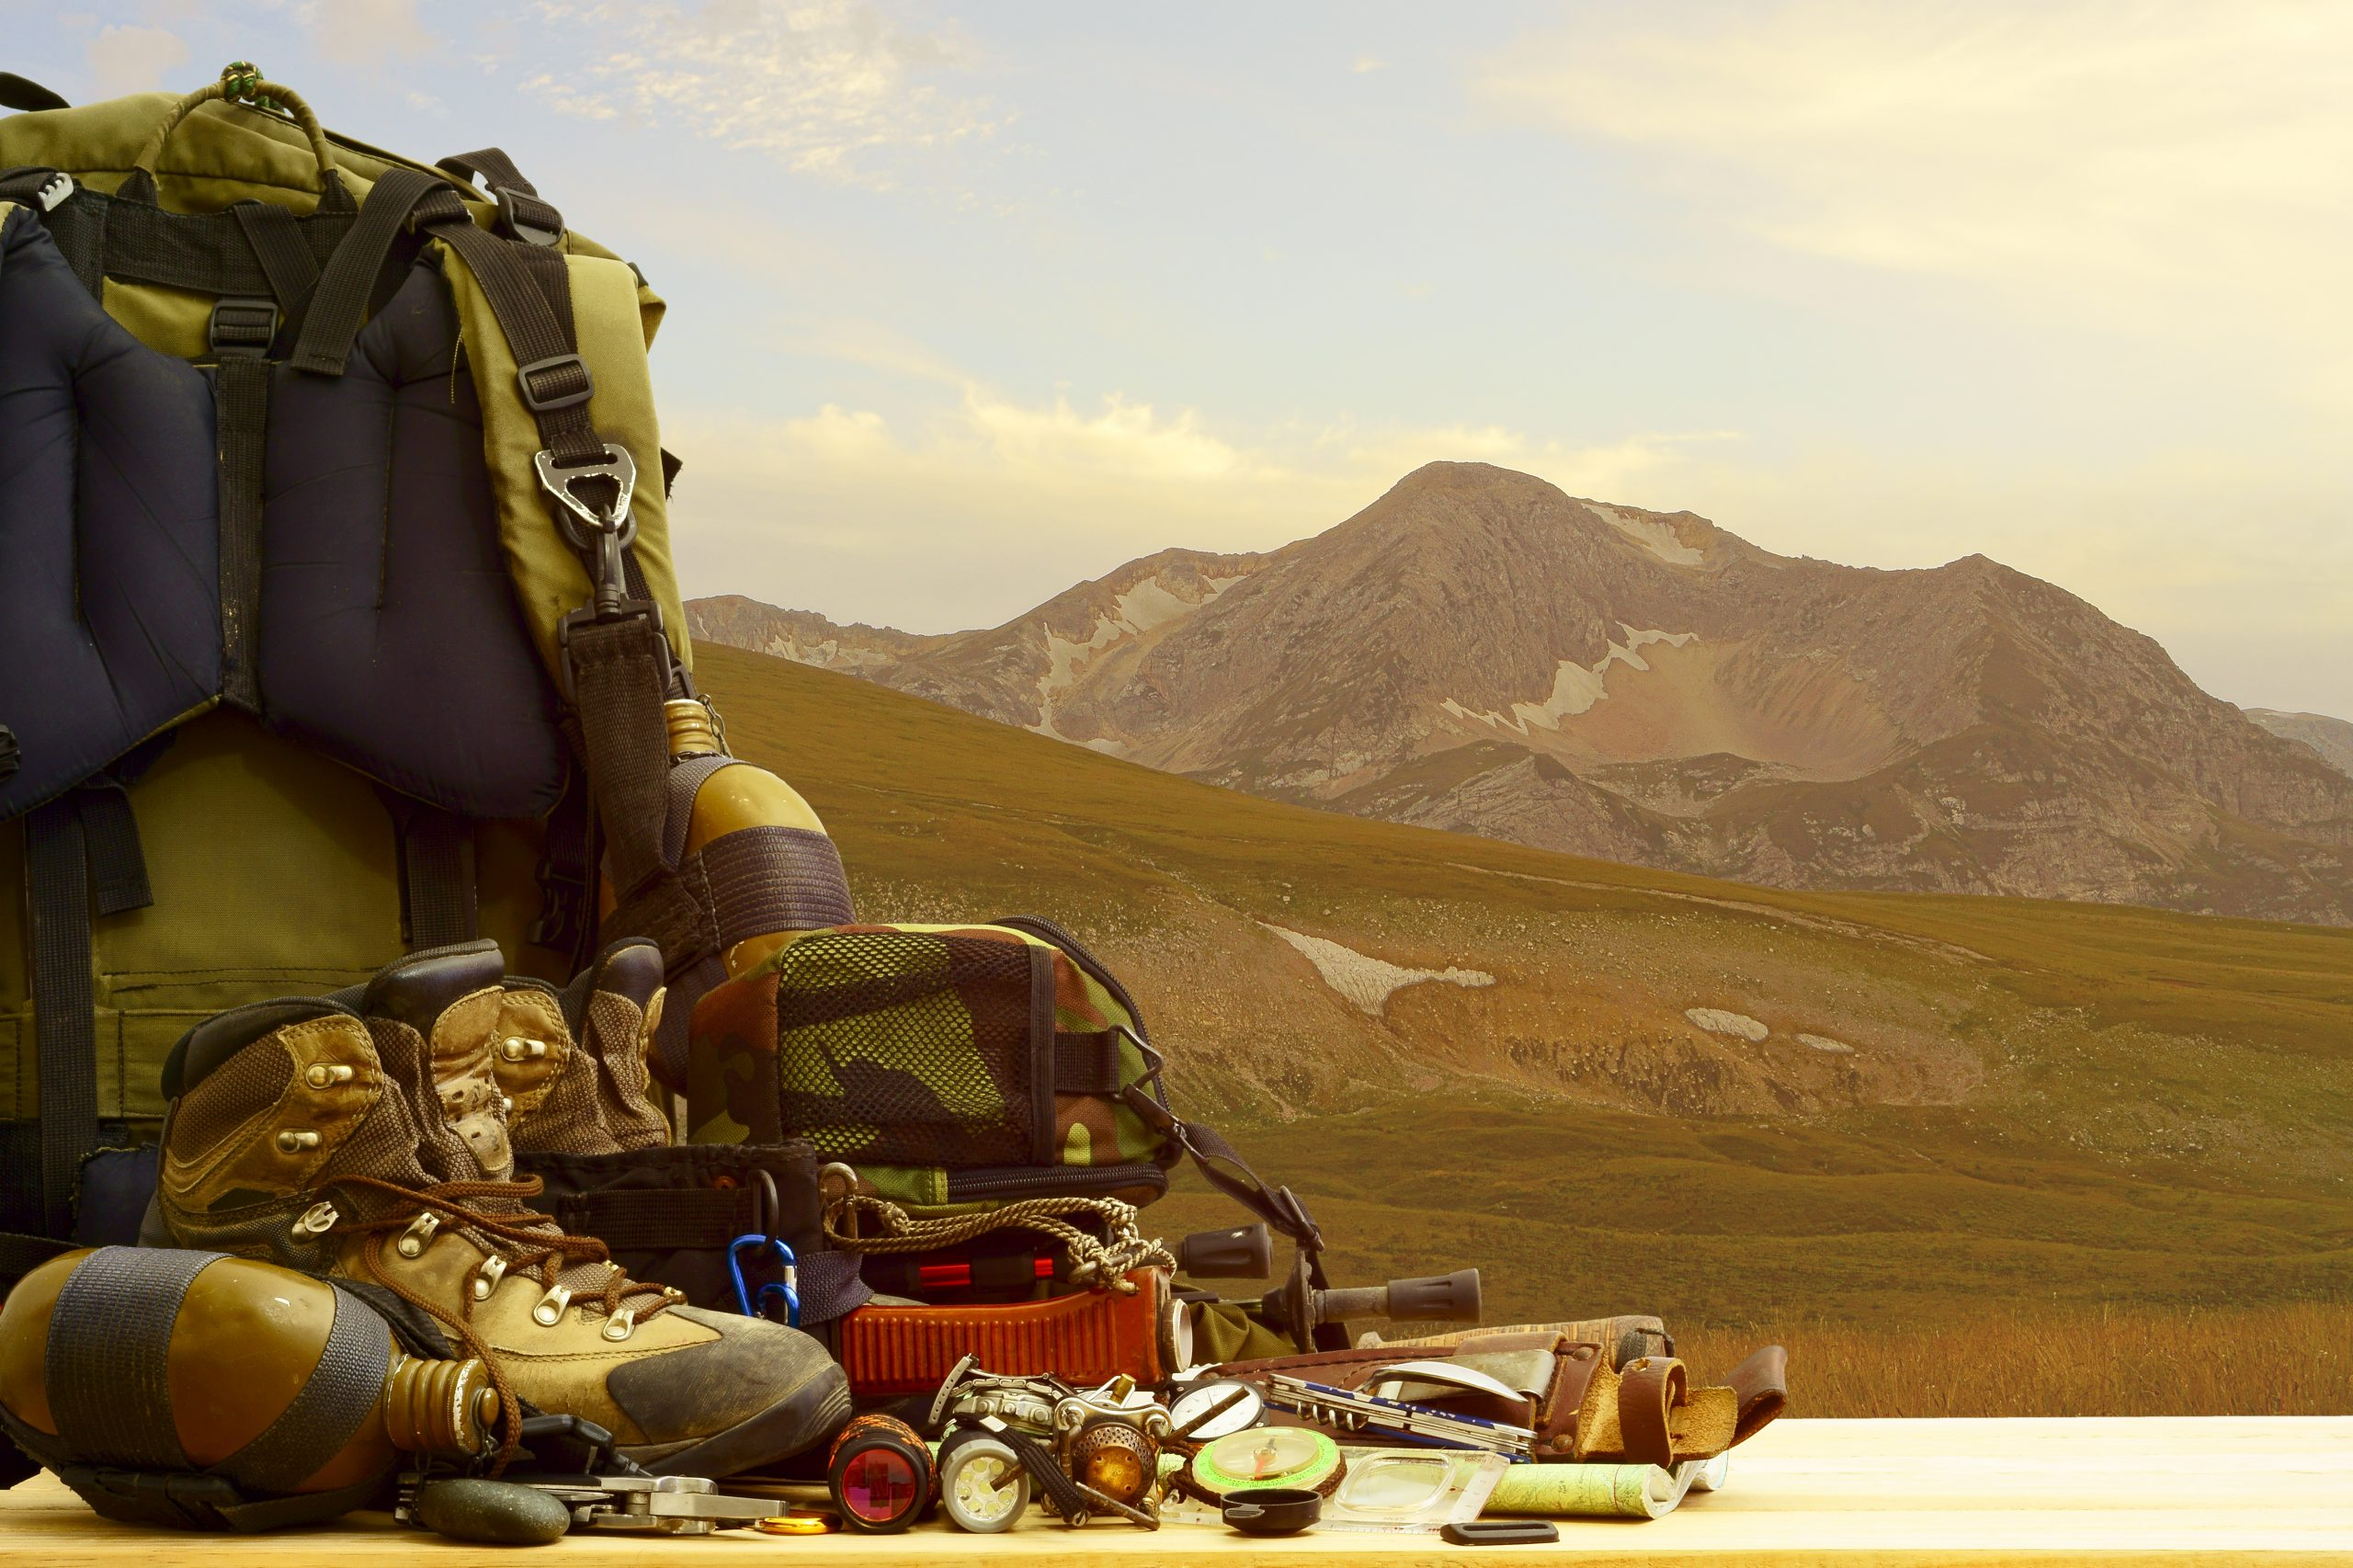 survival-equipment-image